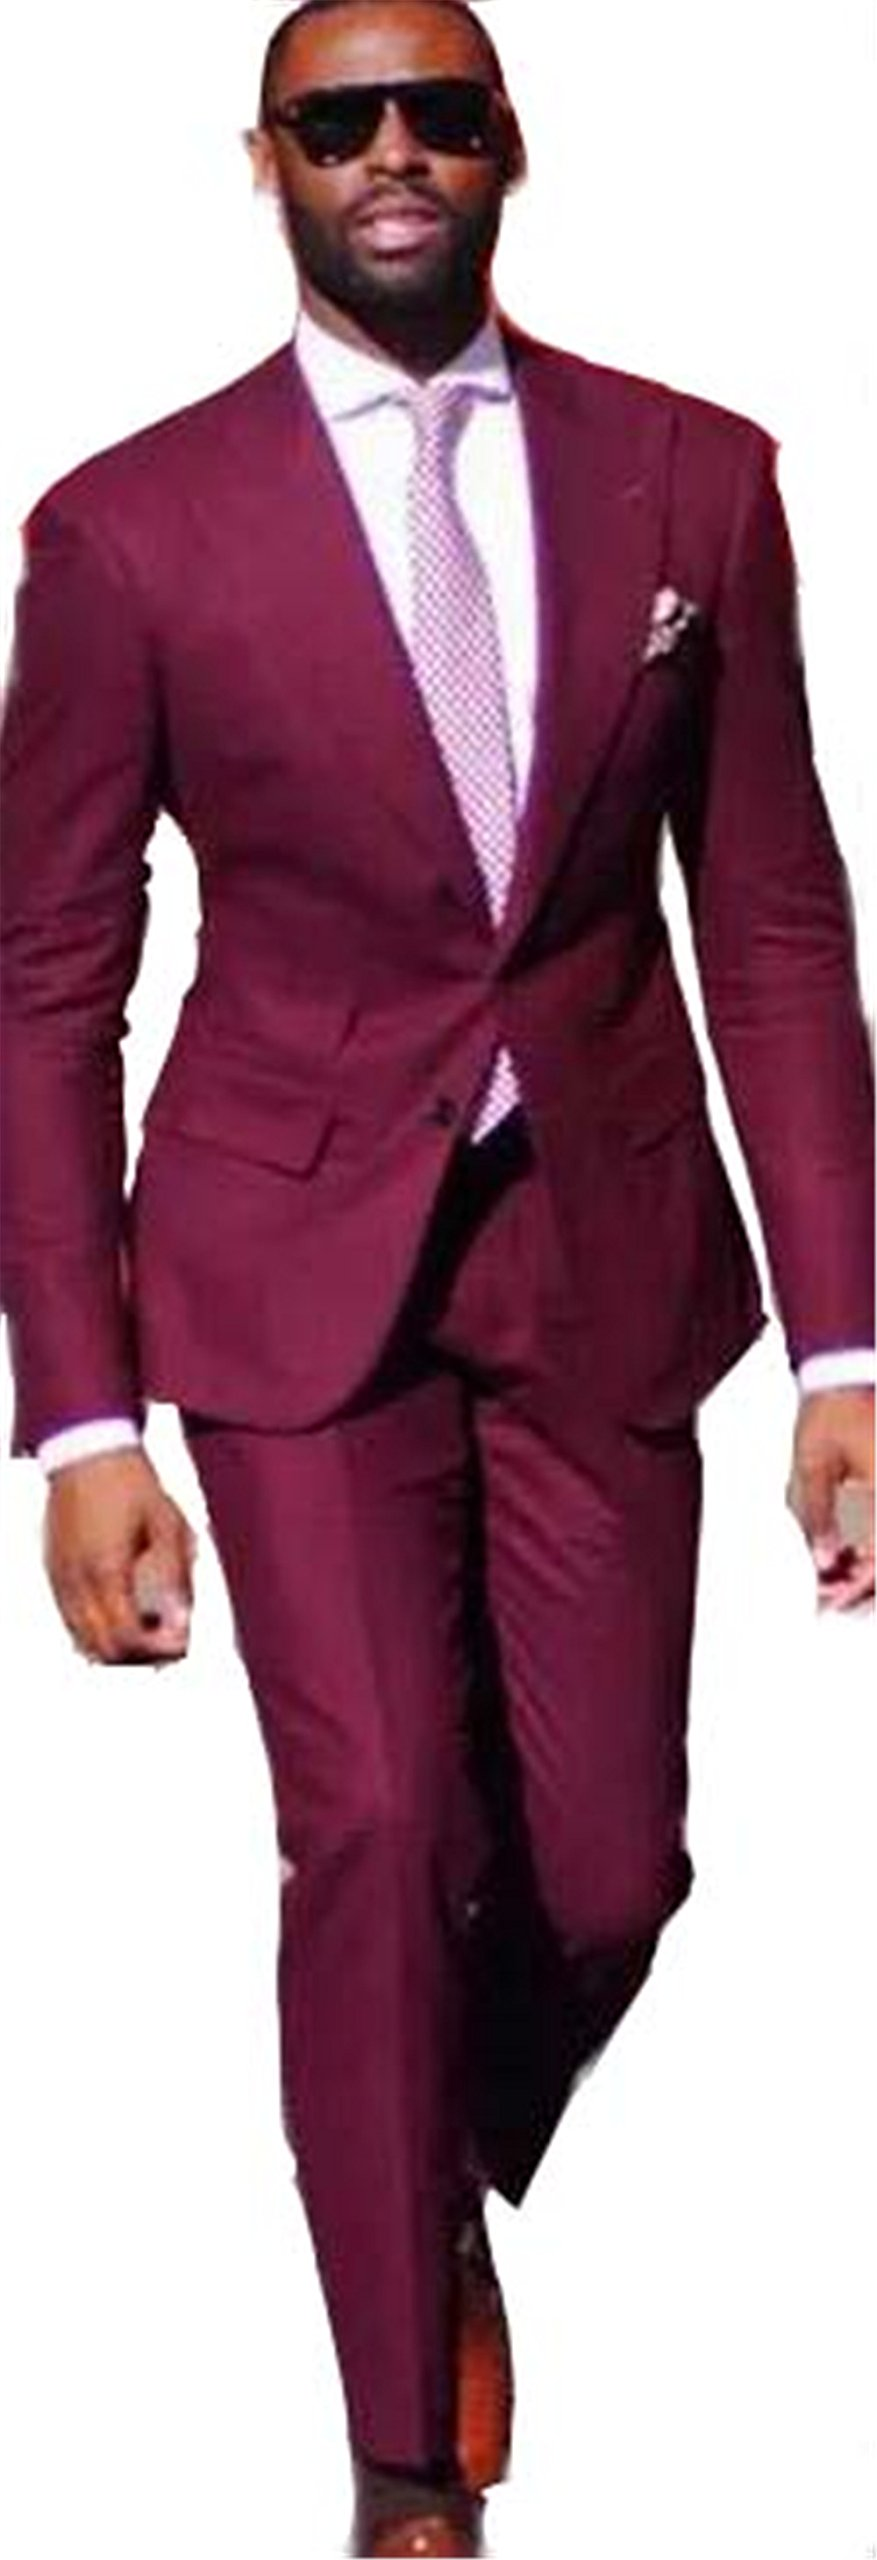 Brightmenyouth Groom Suit Wedding Suits For Men Wedding Groom Tuxedo Suit Black Burgundy Wedding Tuxedos For Men